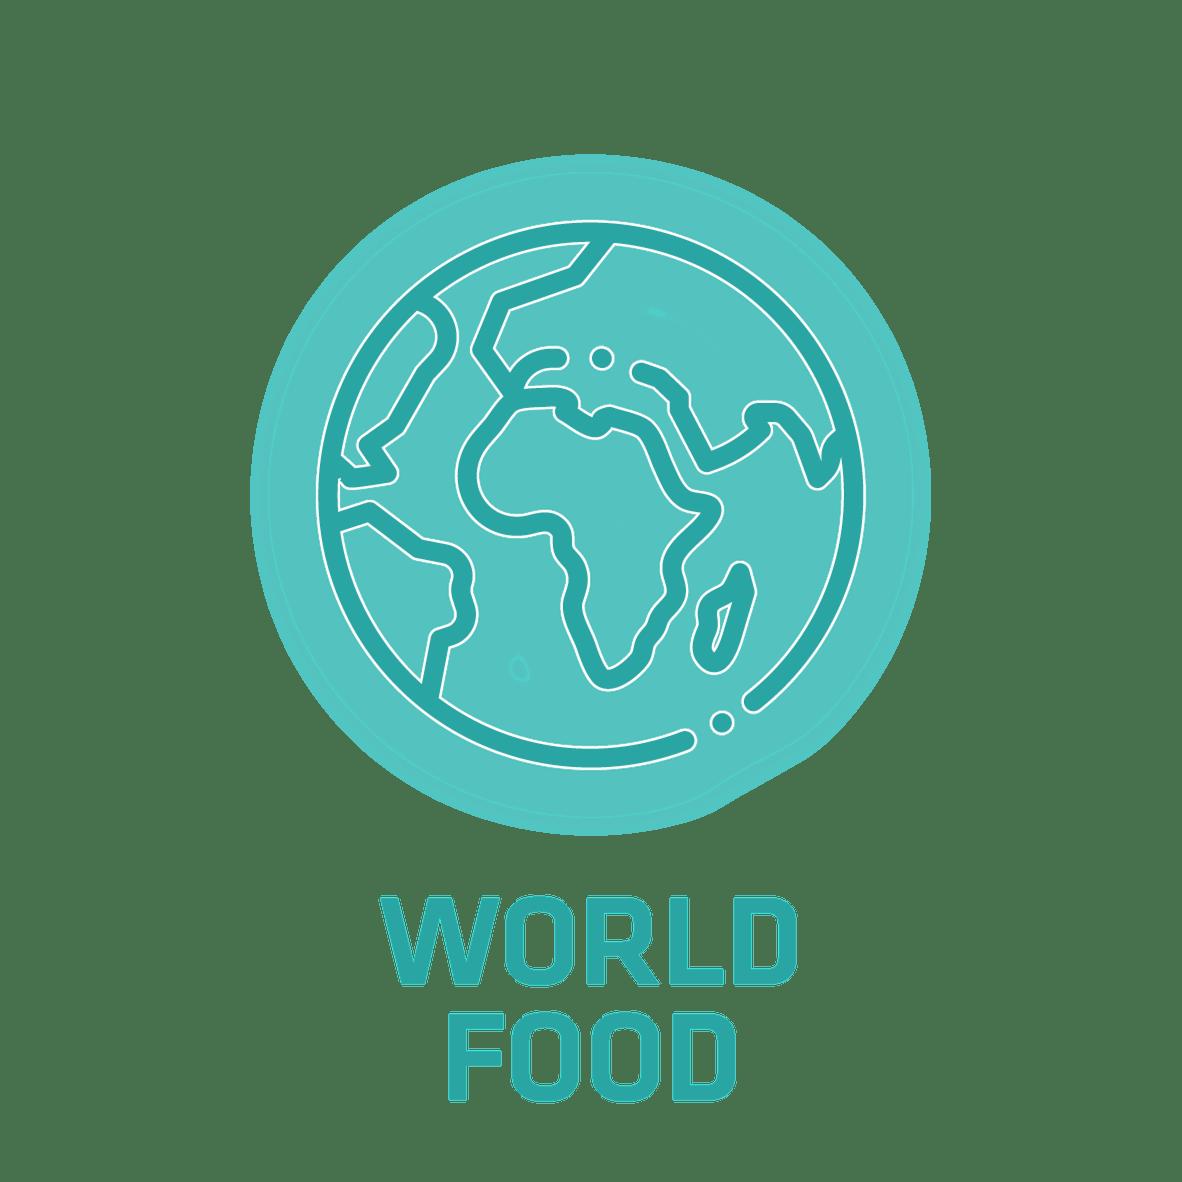 Gulfood World Food